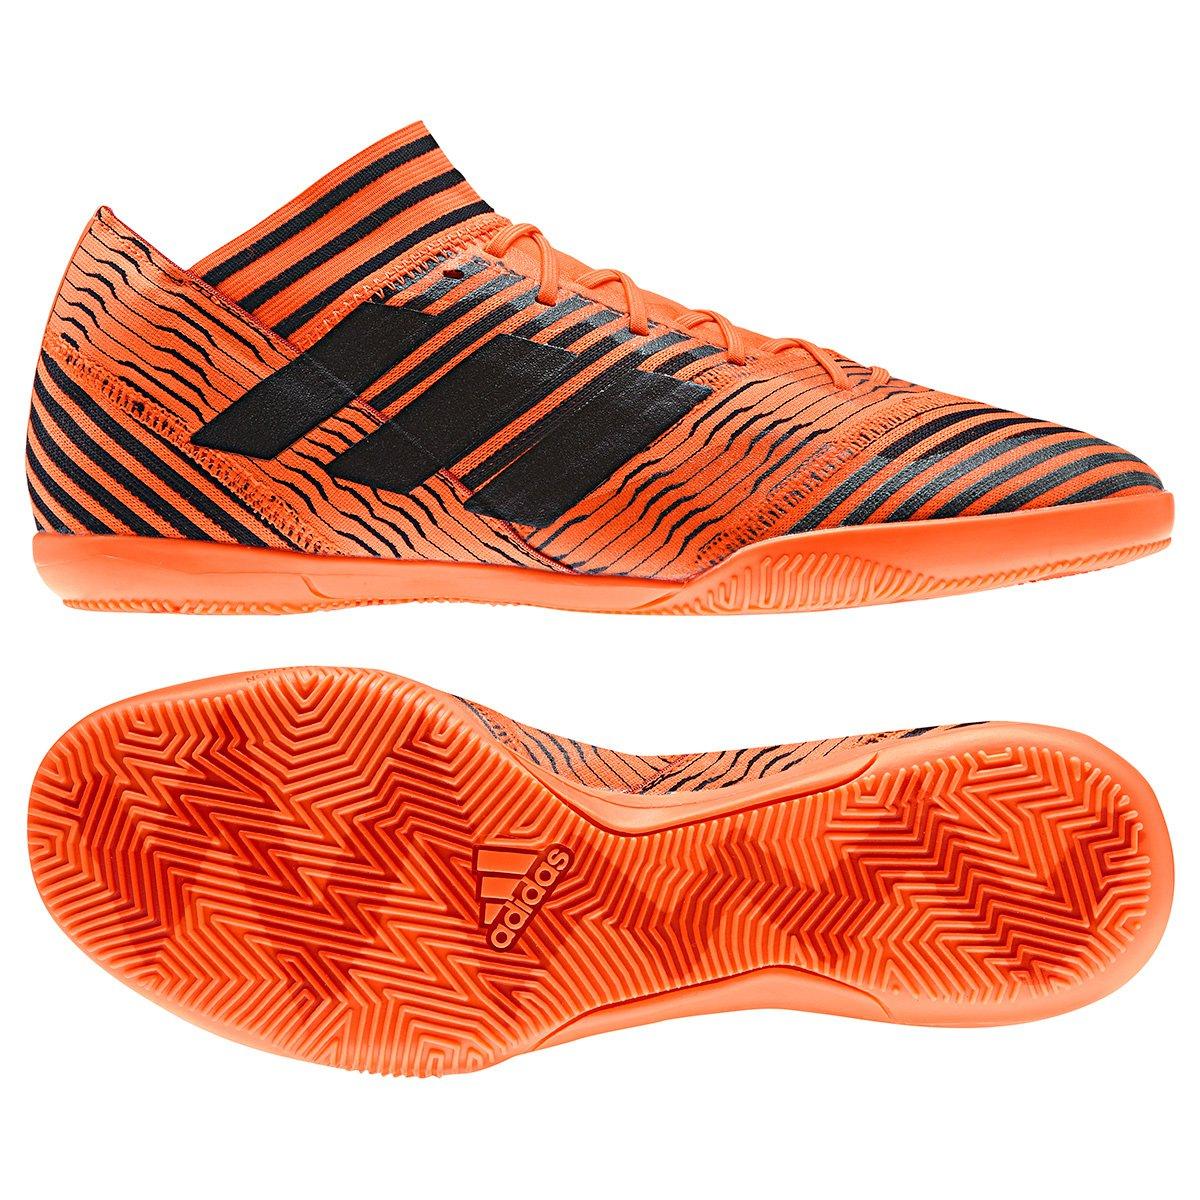 bbf97d0bdd72 Chuteira Futsal Adidas Nemeziz 17.3 IN - Compre Agora